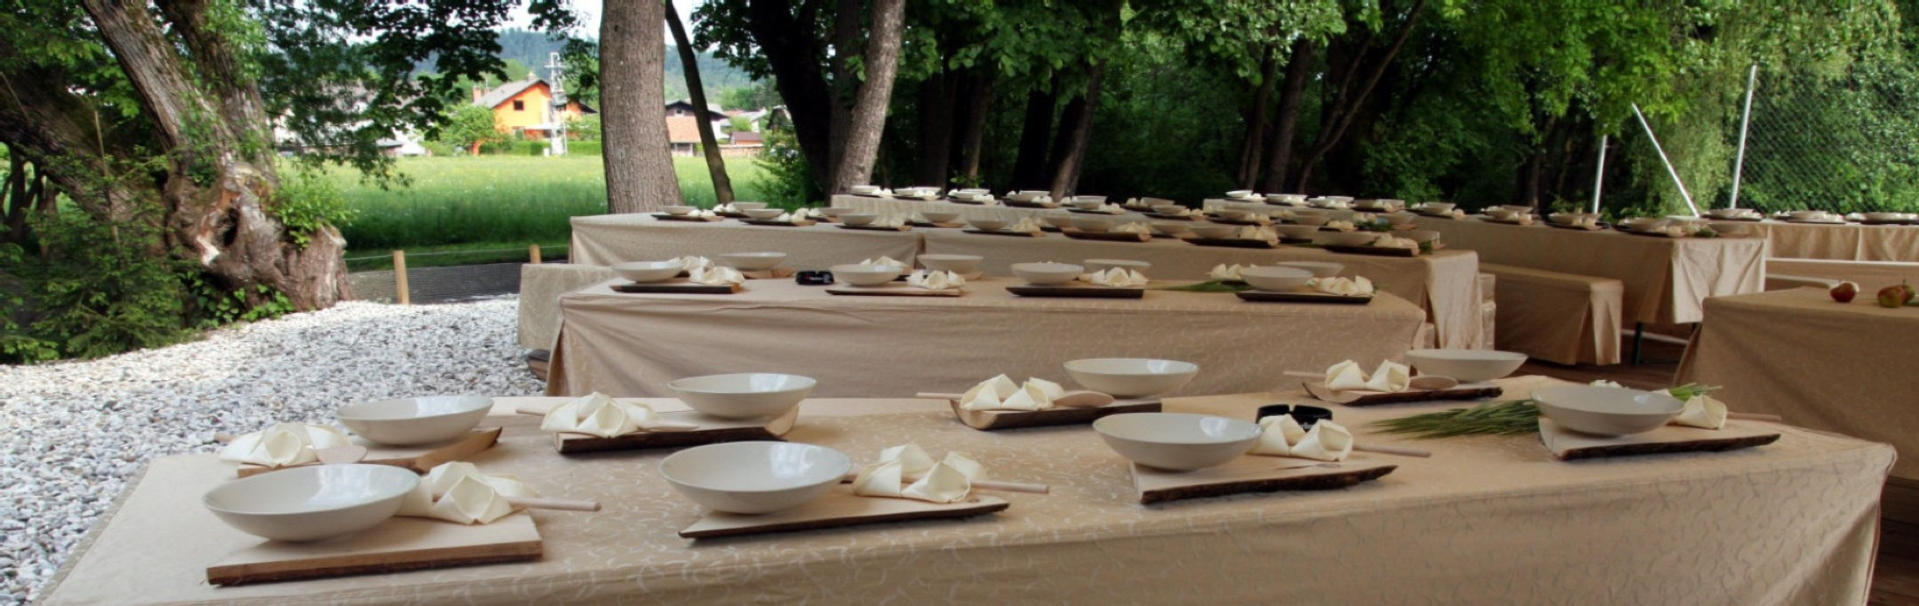 �arobni piknik